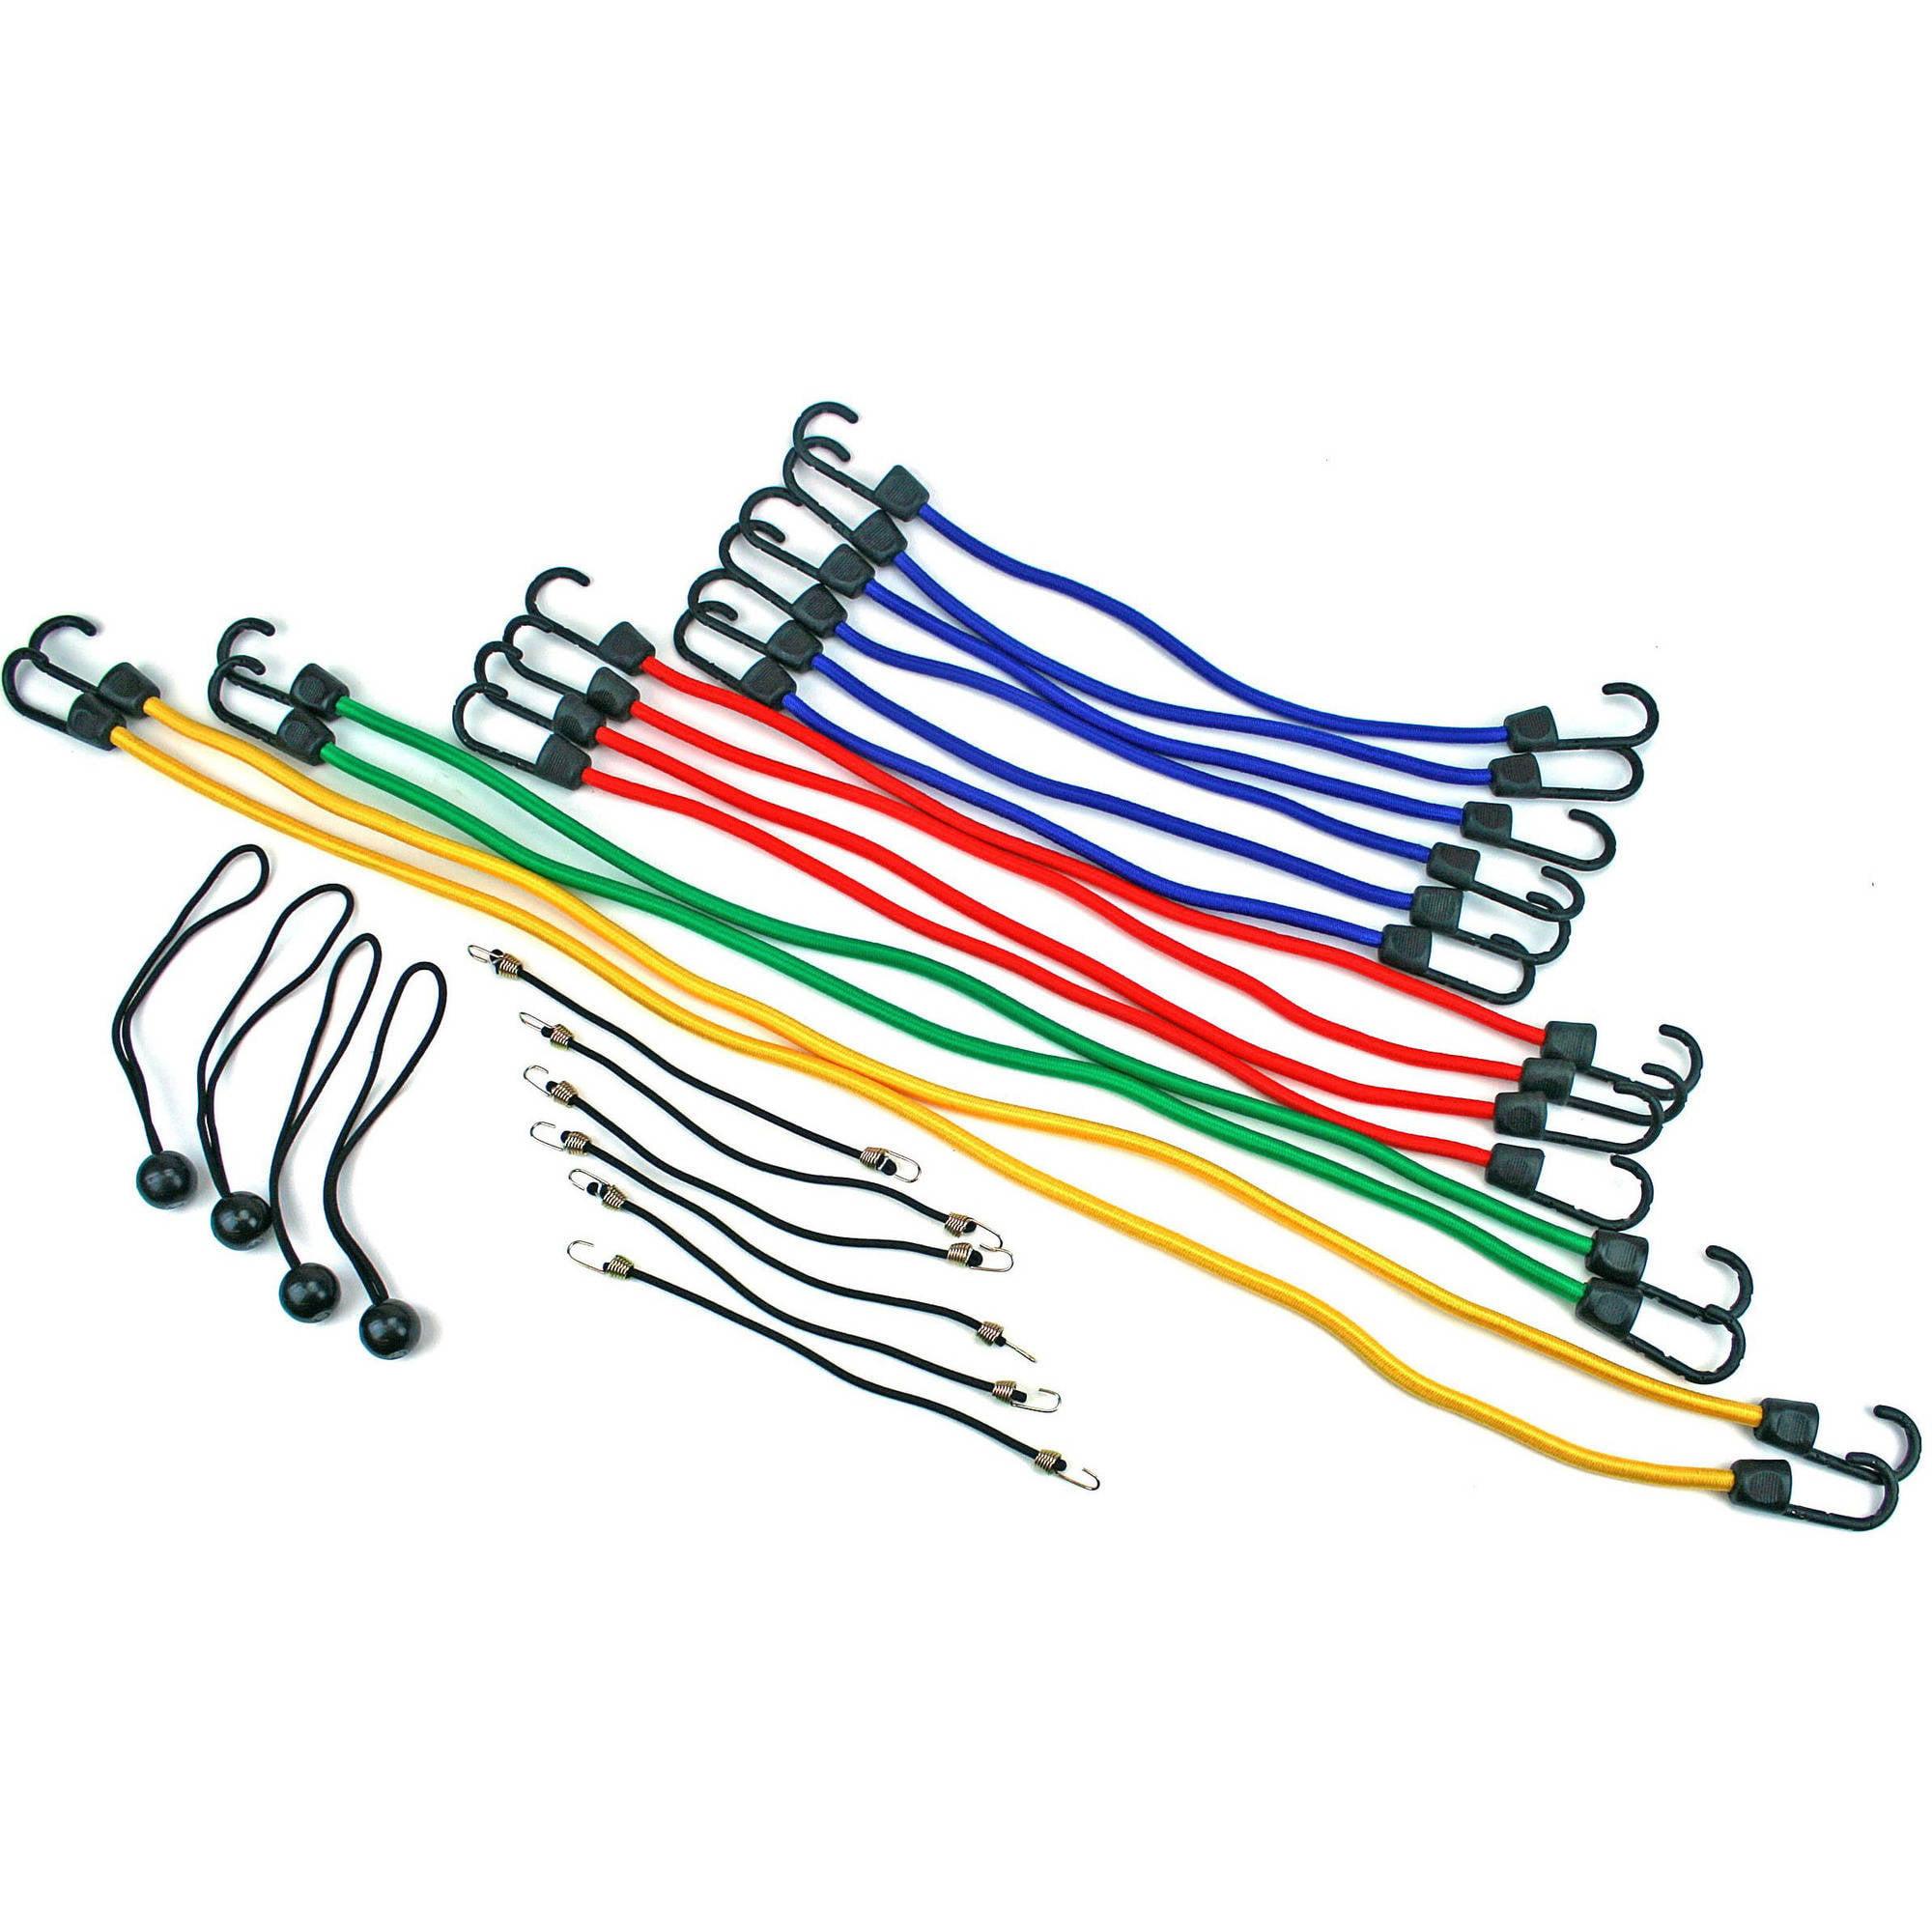 Highland 24-Piece Bungee Cord Assortment, Model # 9008400